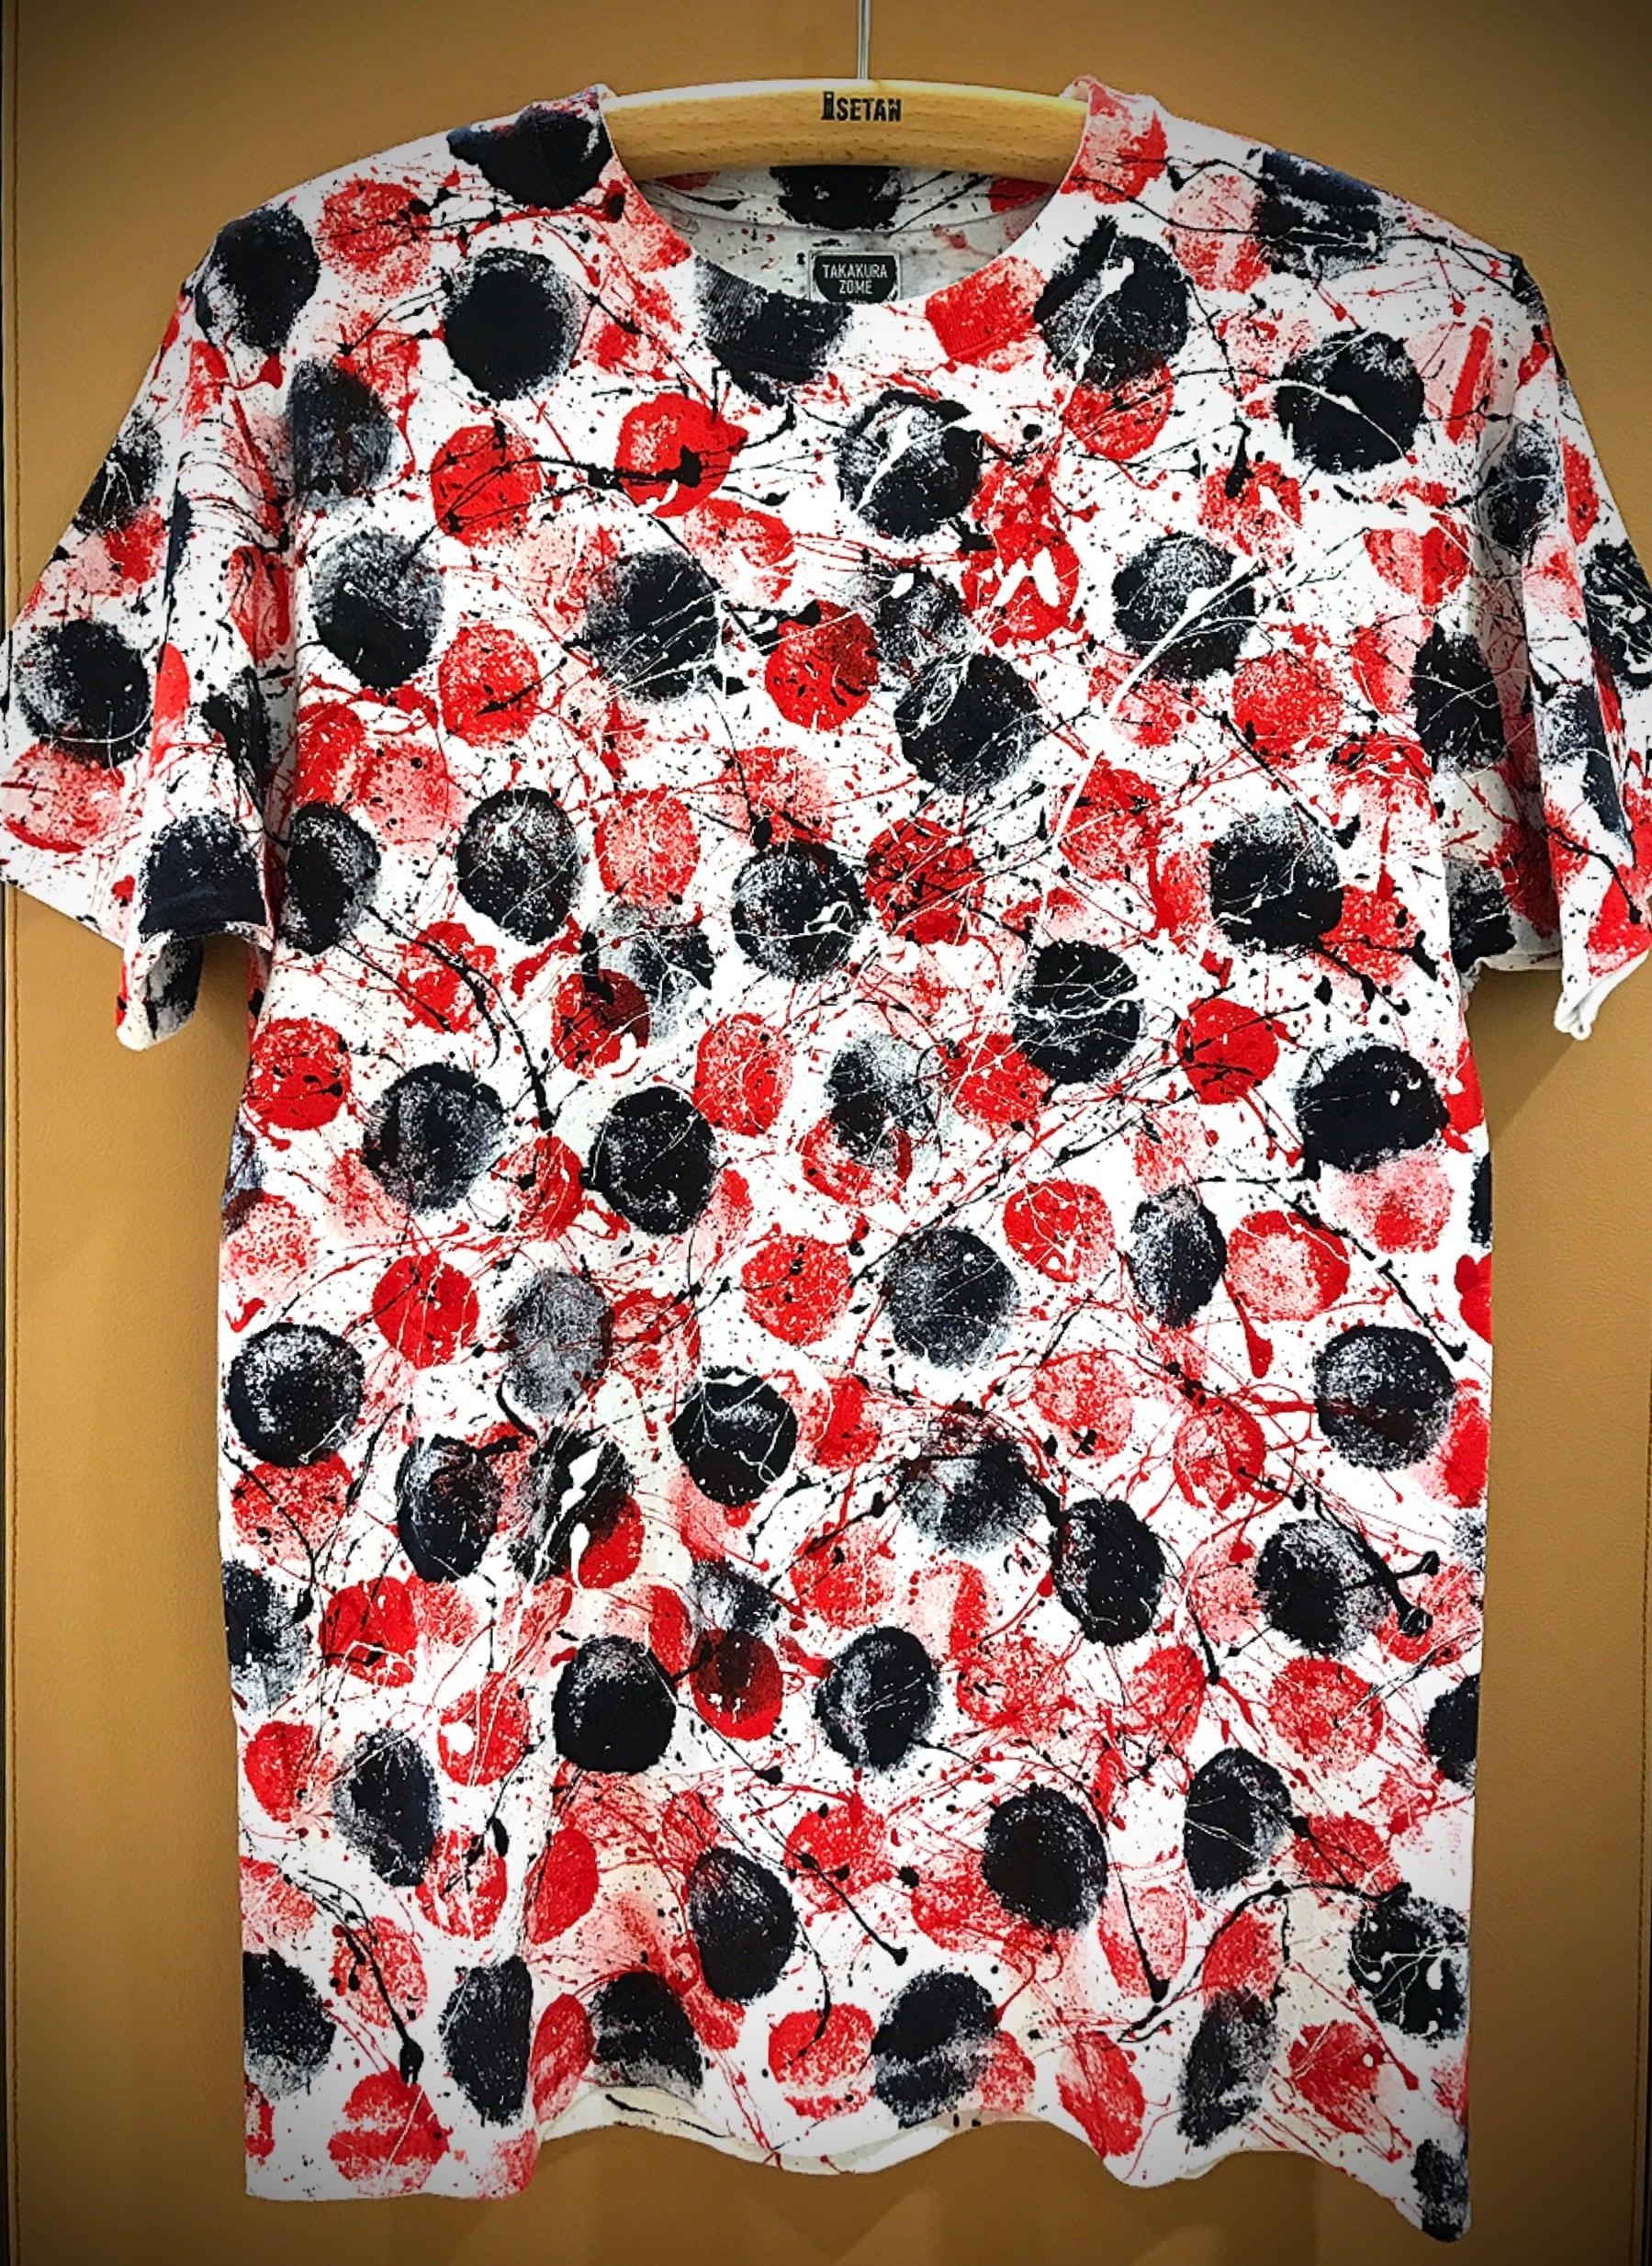 Freedom ドットシブキTシャツ(白地×黒+赤モチーフ)